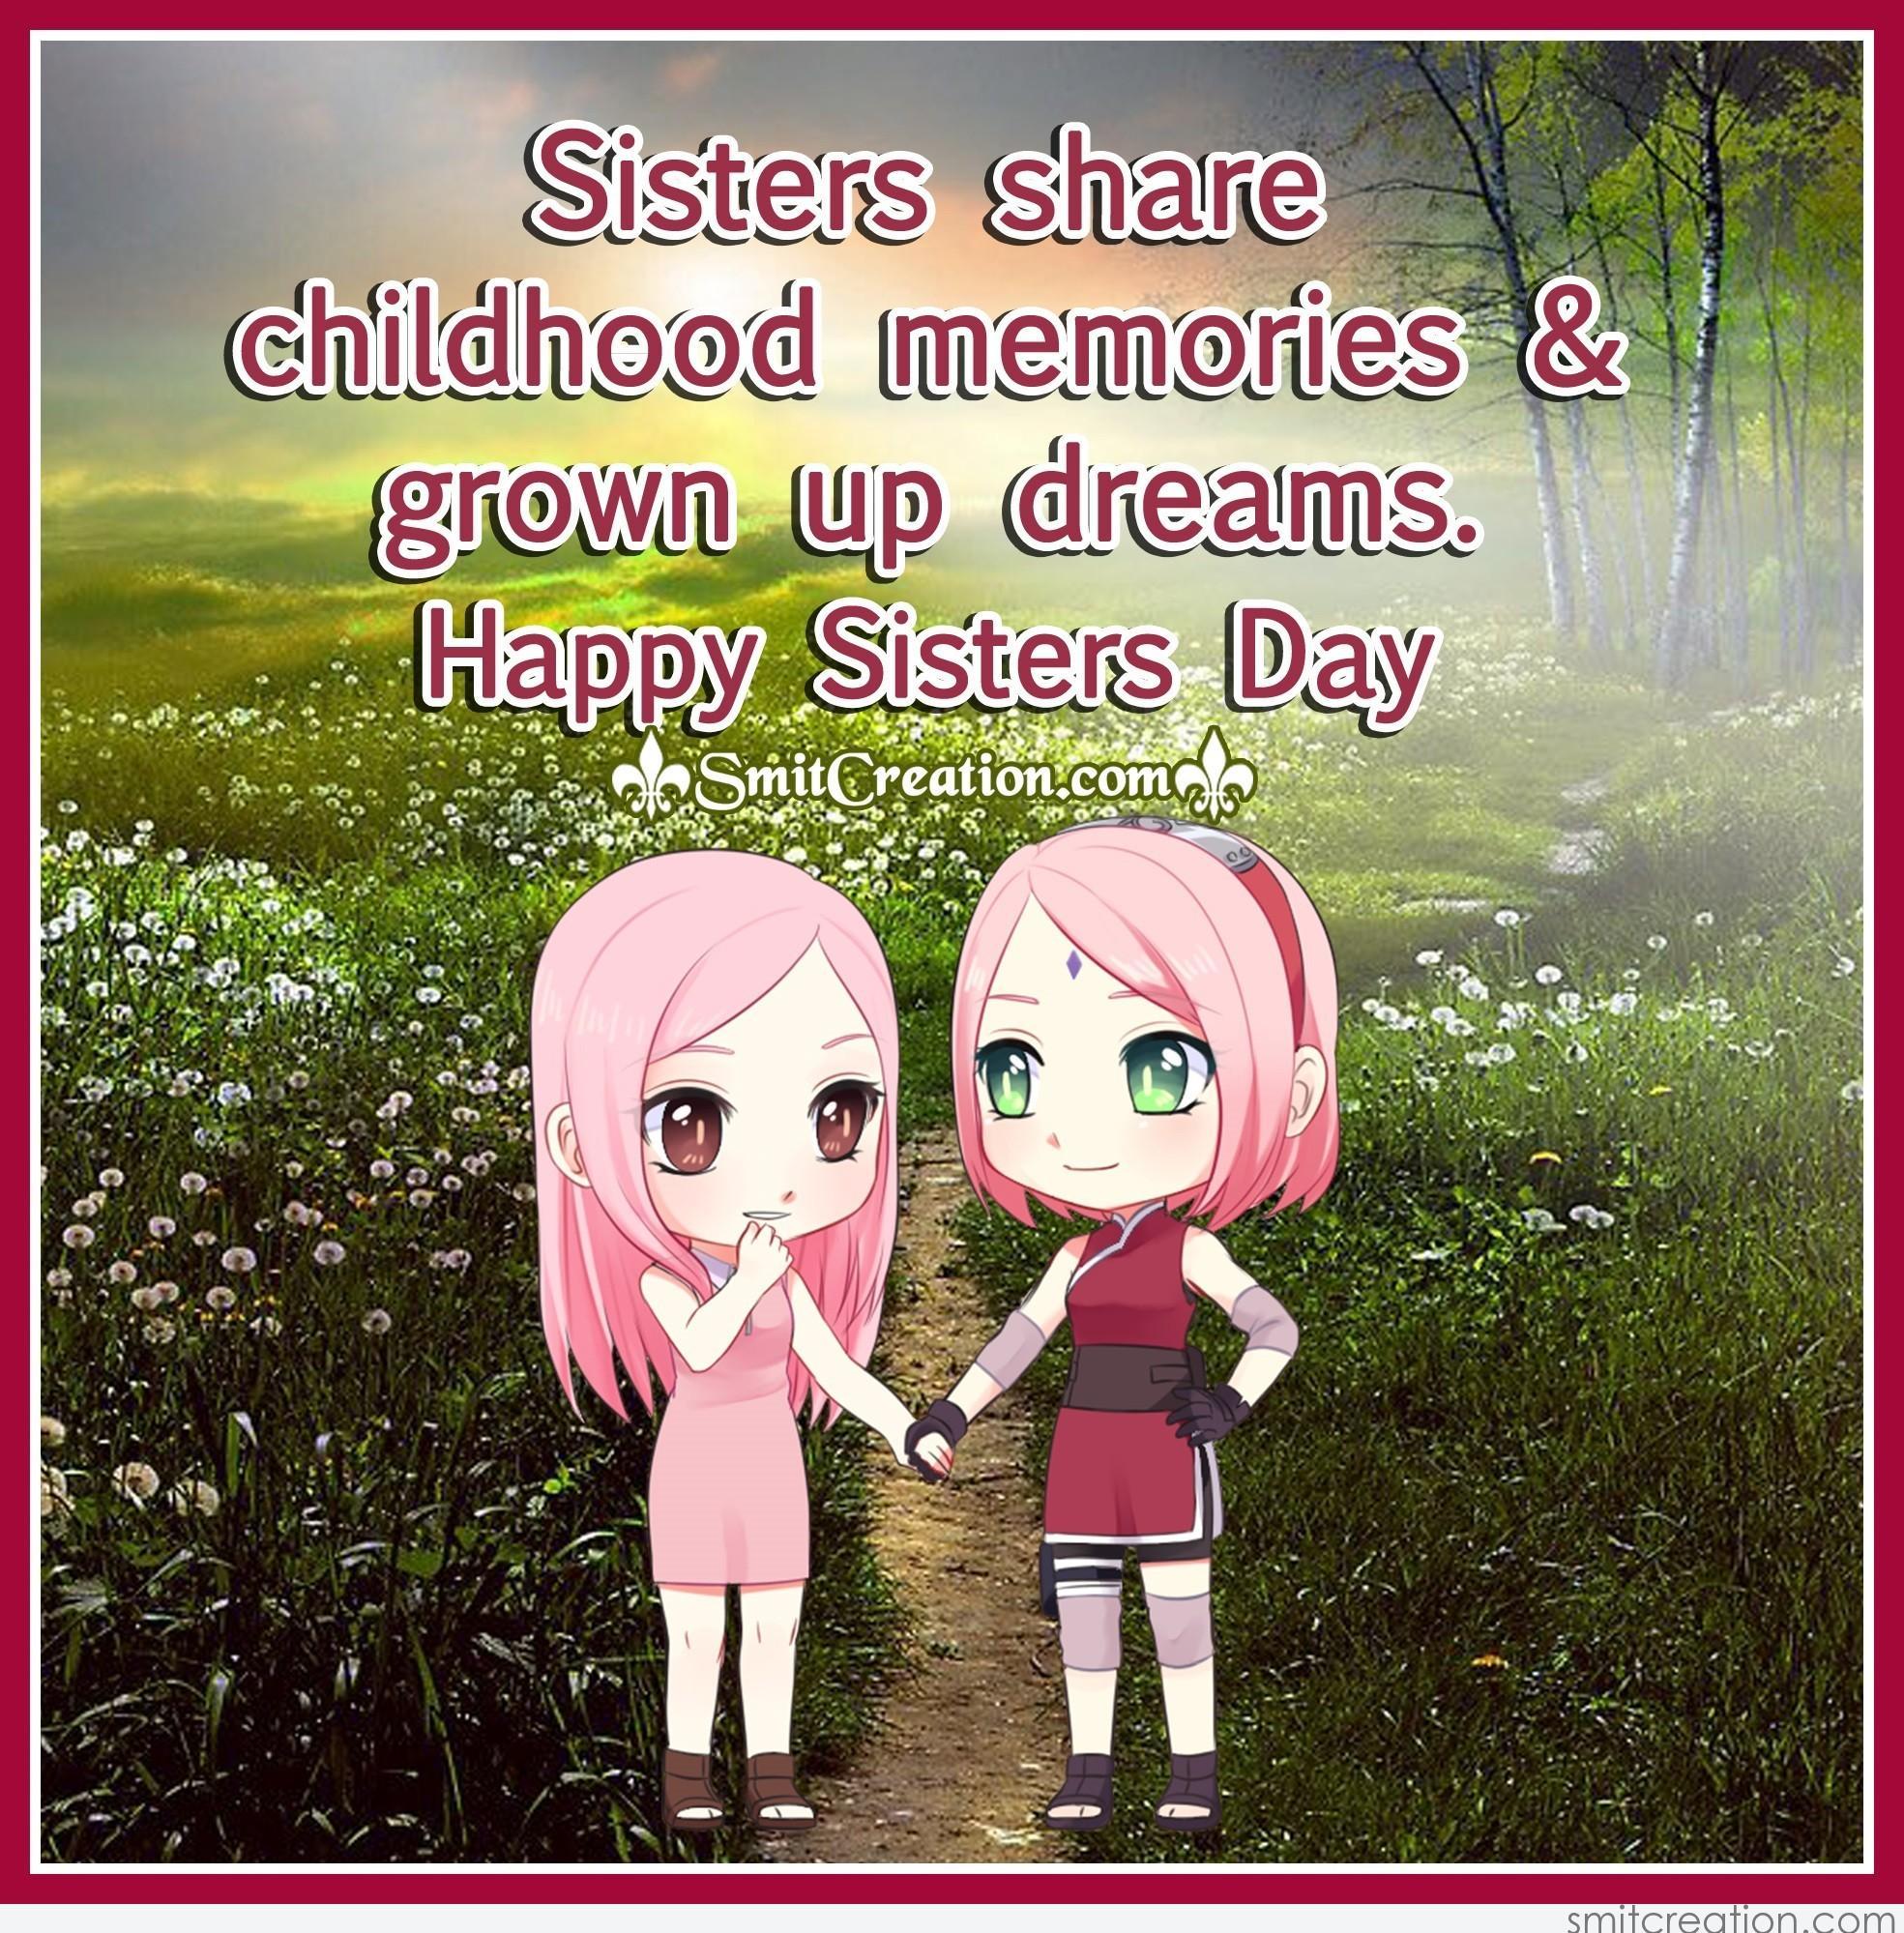 |Sisterhood Day